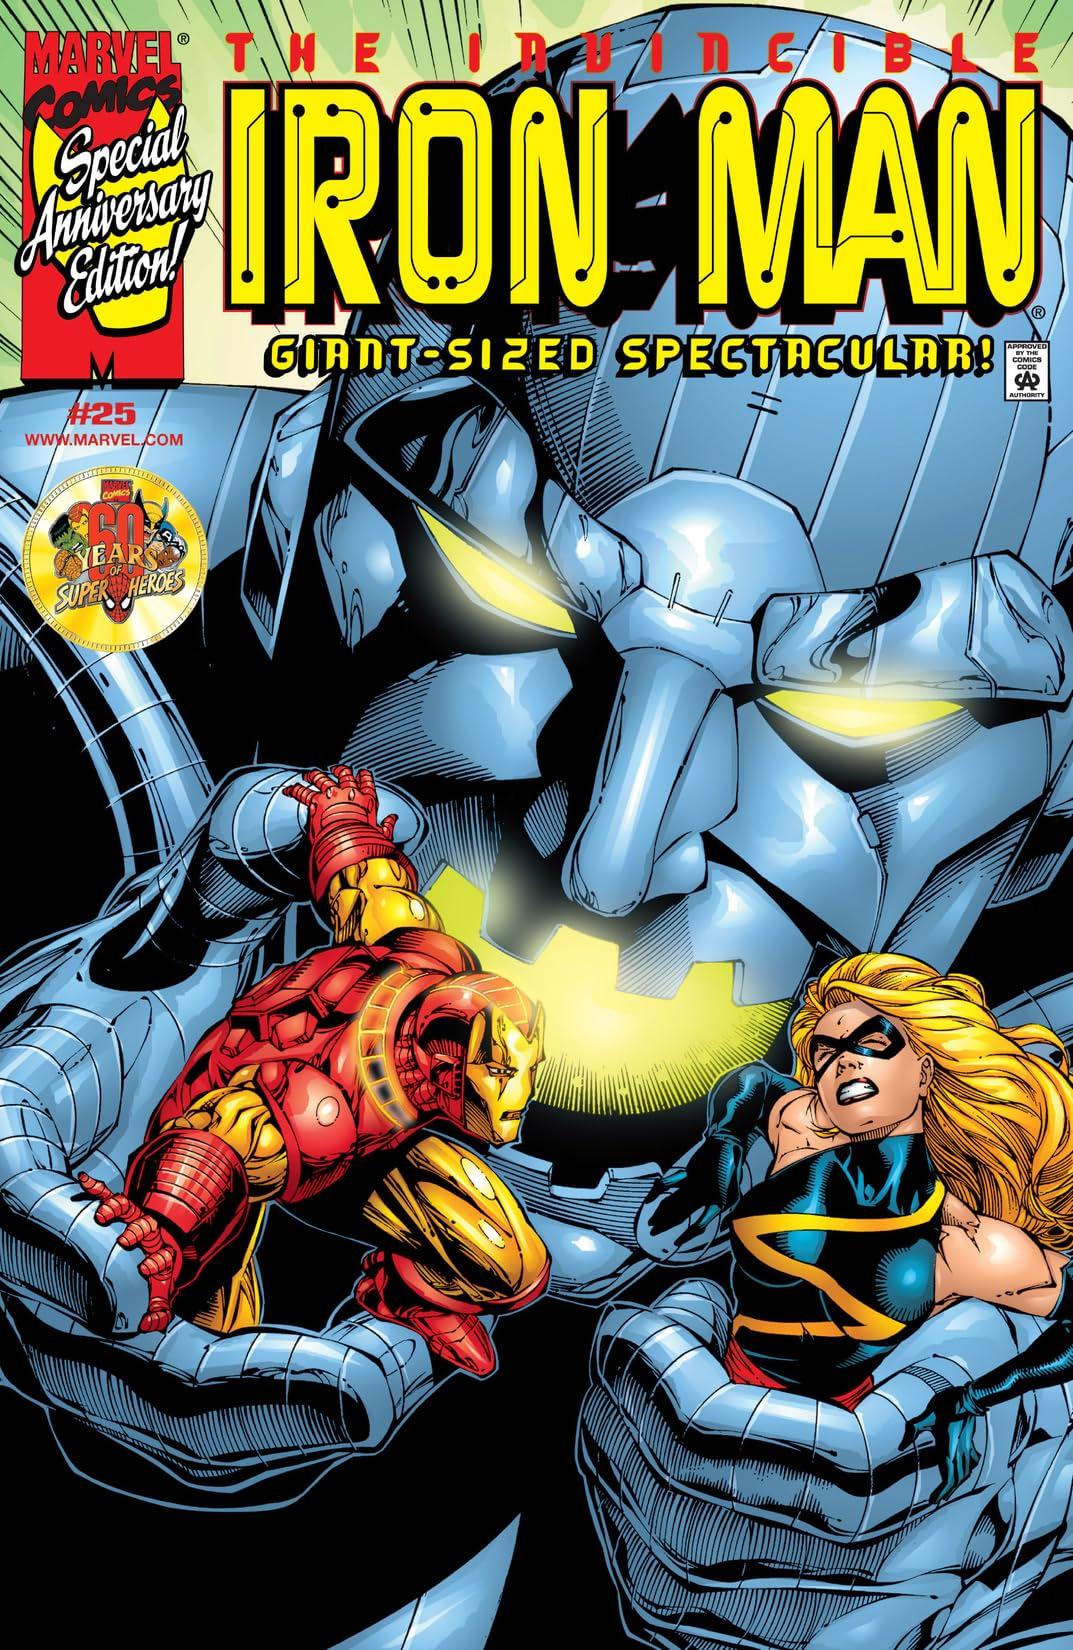 Iron Man (1998-2004) #25